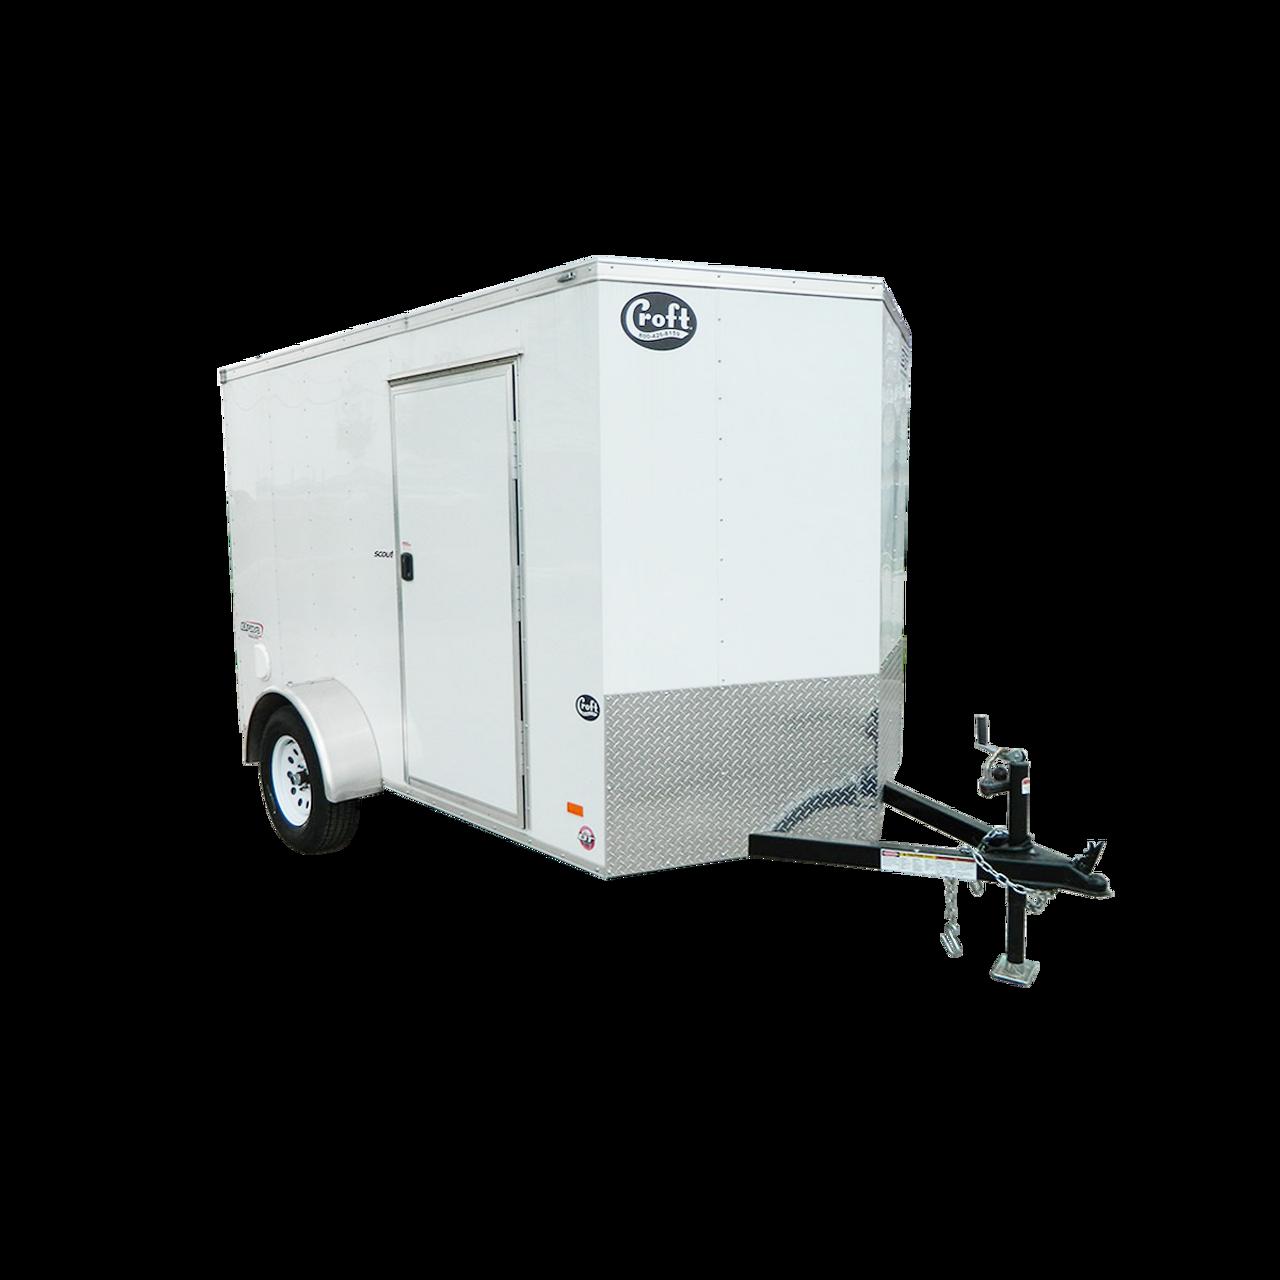 SC610SADRDGT --- 6' X 10' Enclosed Trailer with Ramp Door - Torsion - Bravo